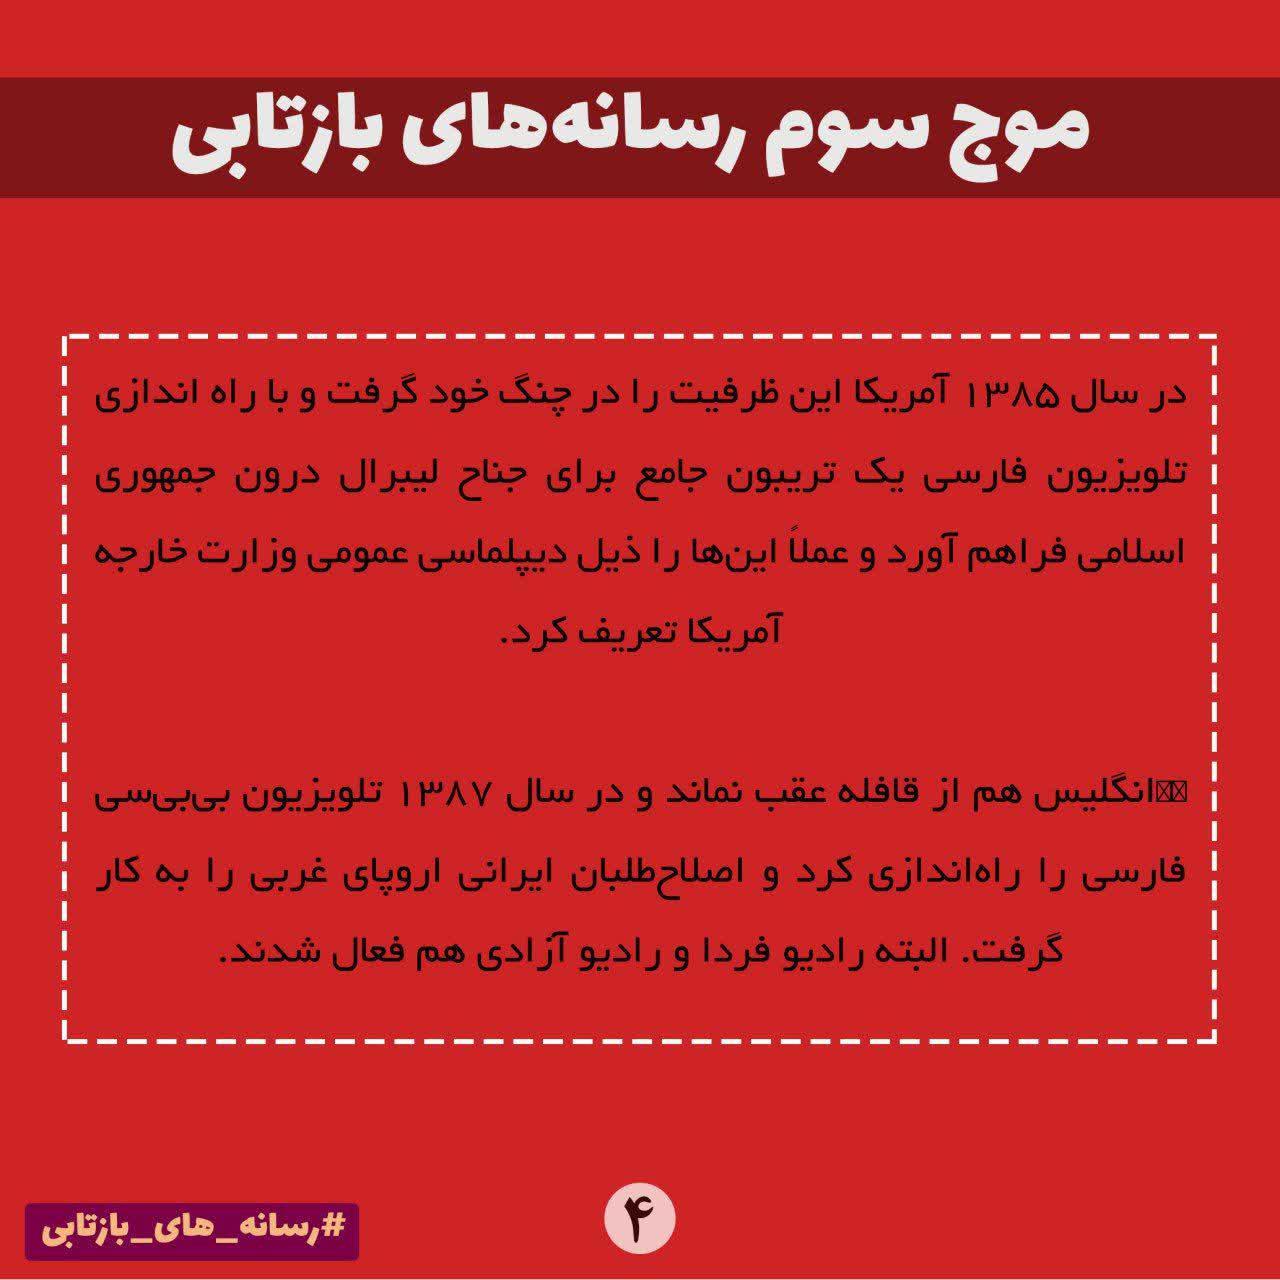 http://dl-abbasi.ir/yekta/1398/Graphic/RMT/2/4.jpg